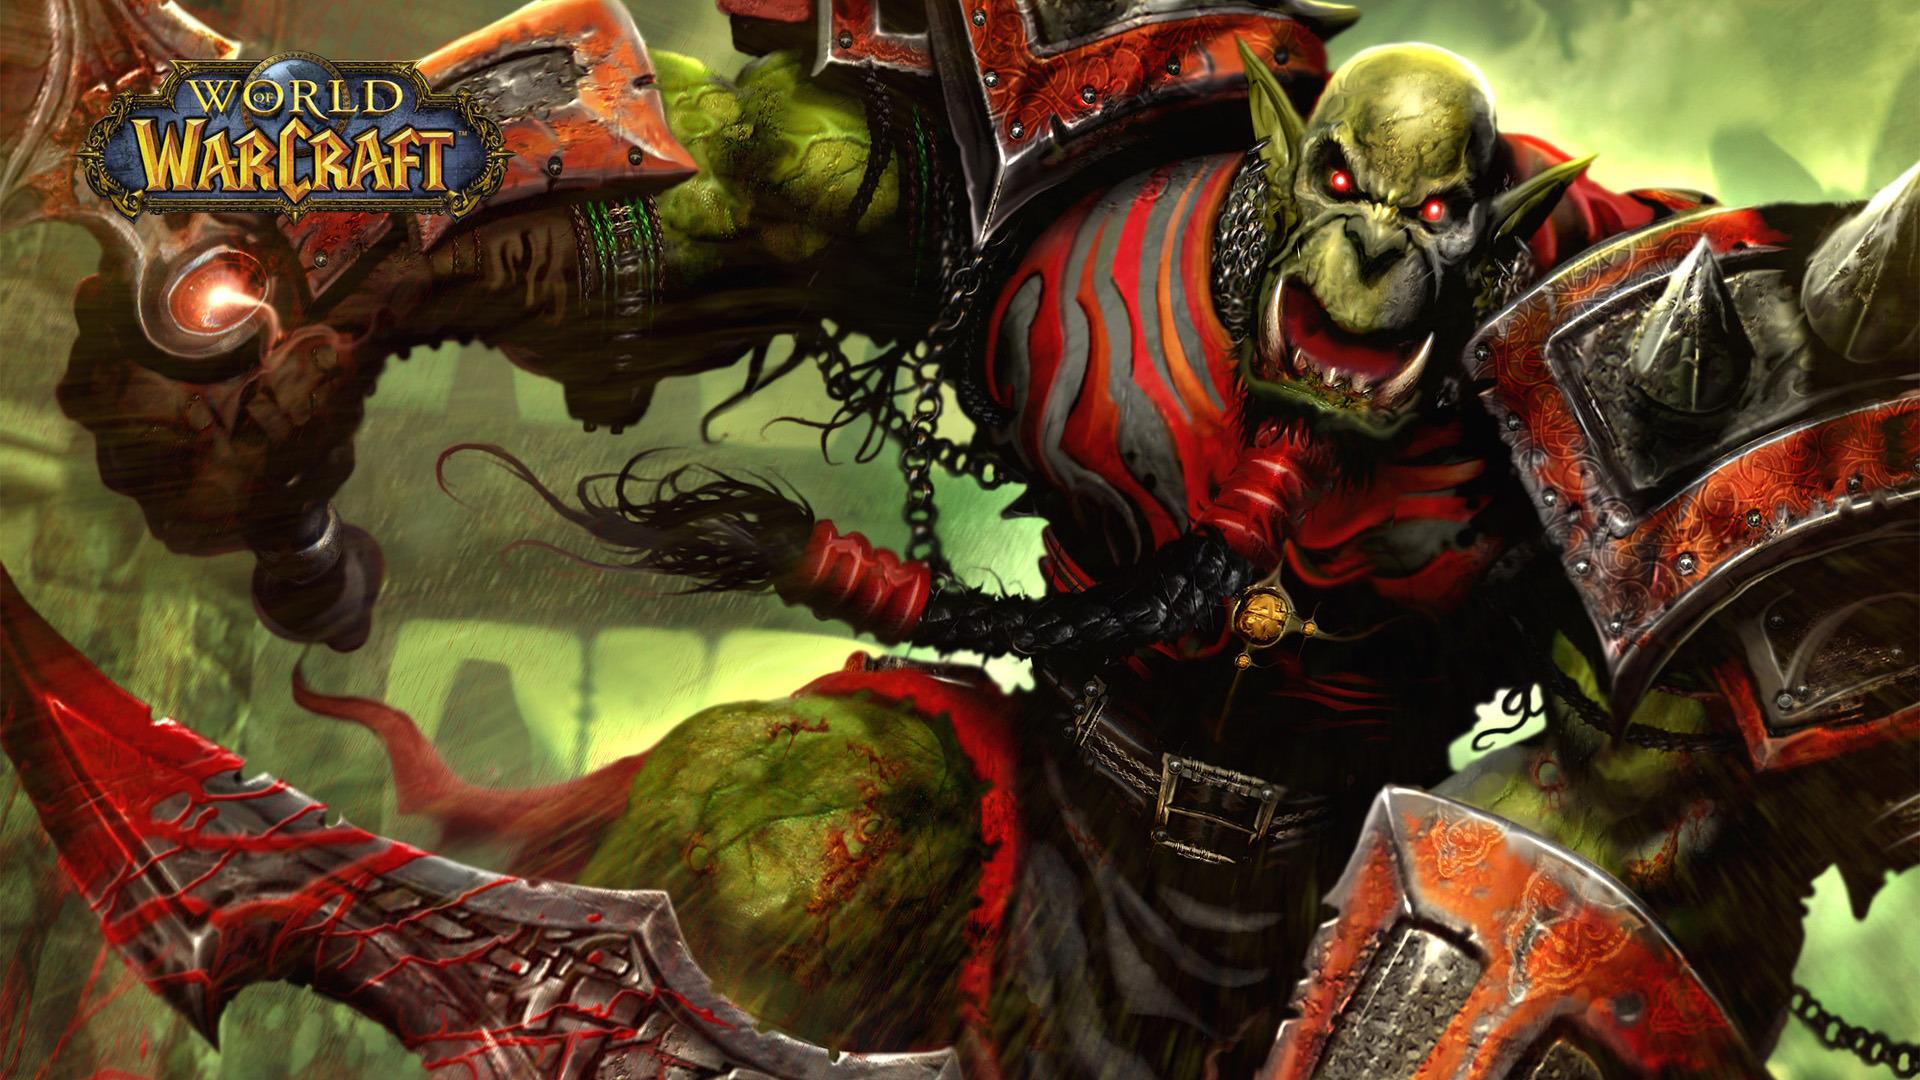 World Of Warcraft wallpaper   111600 1920x1080